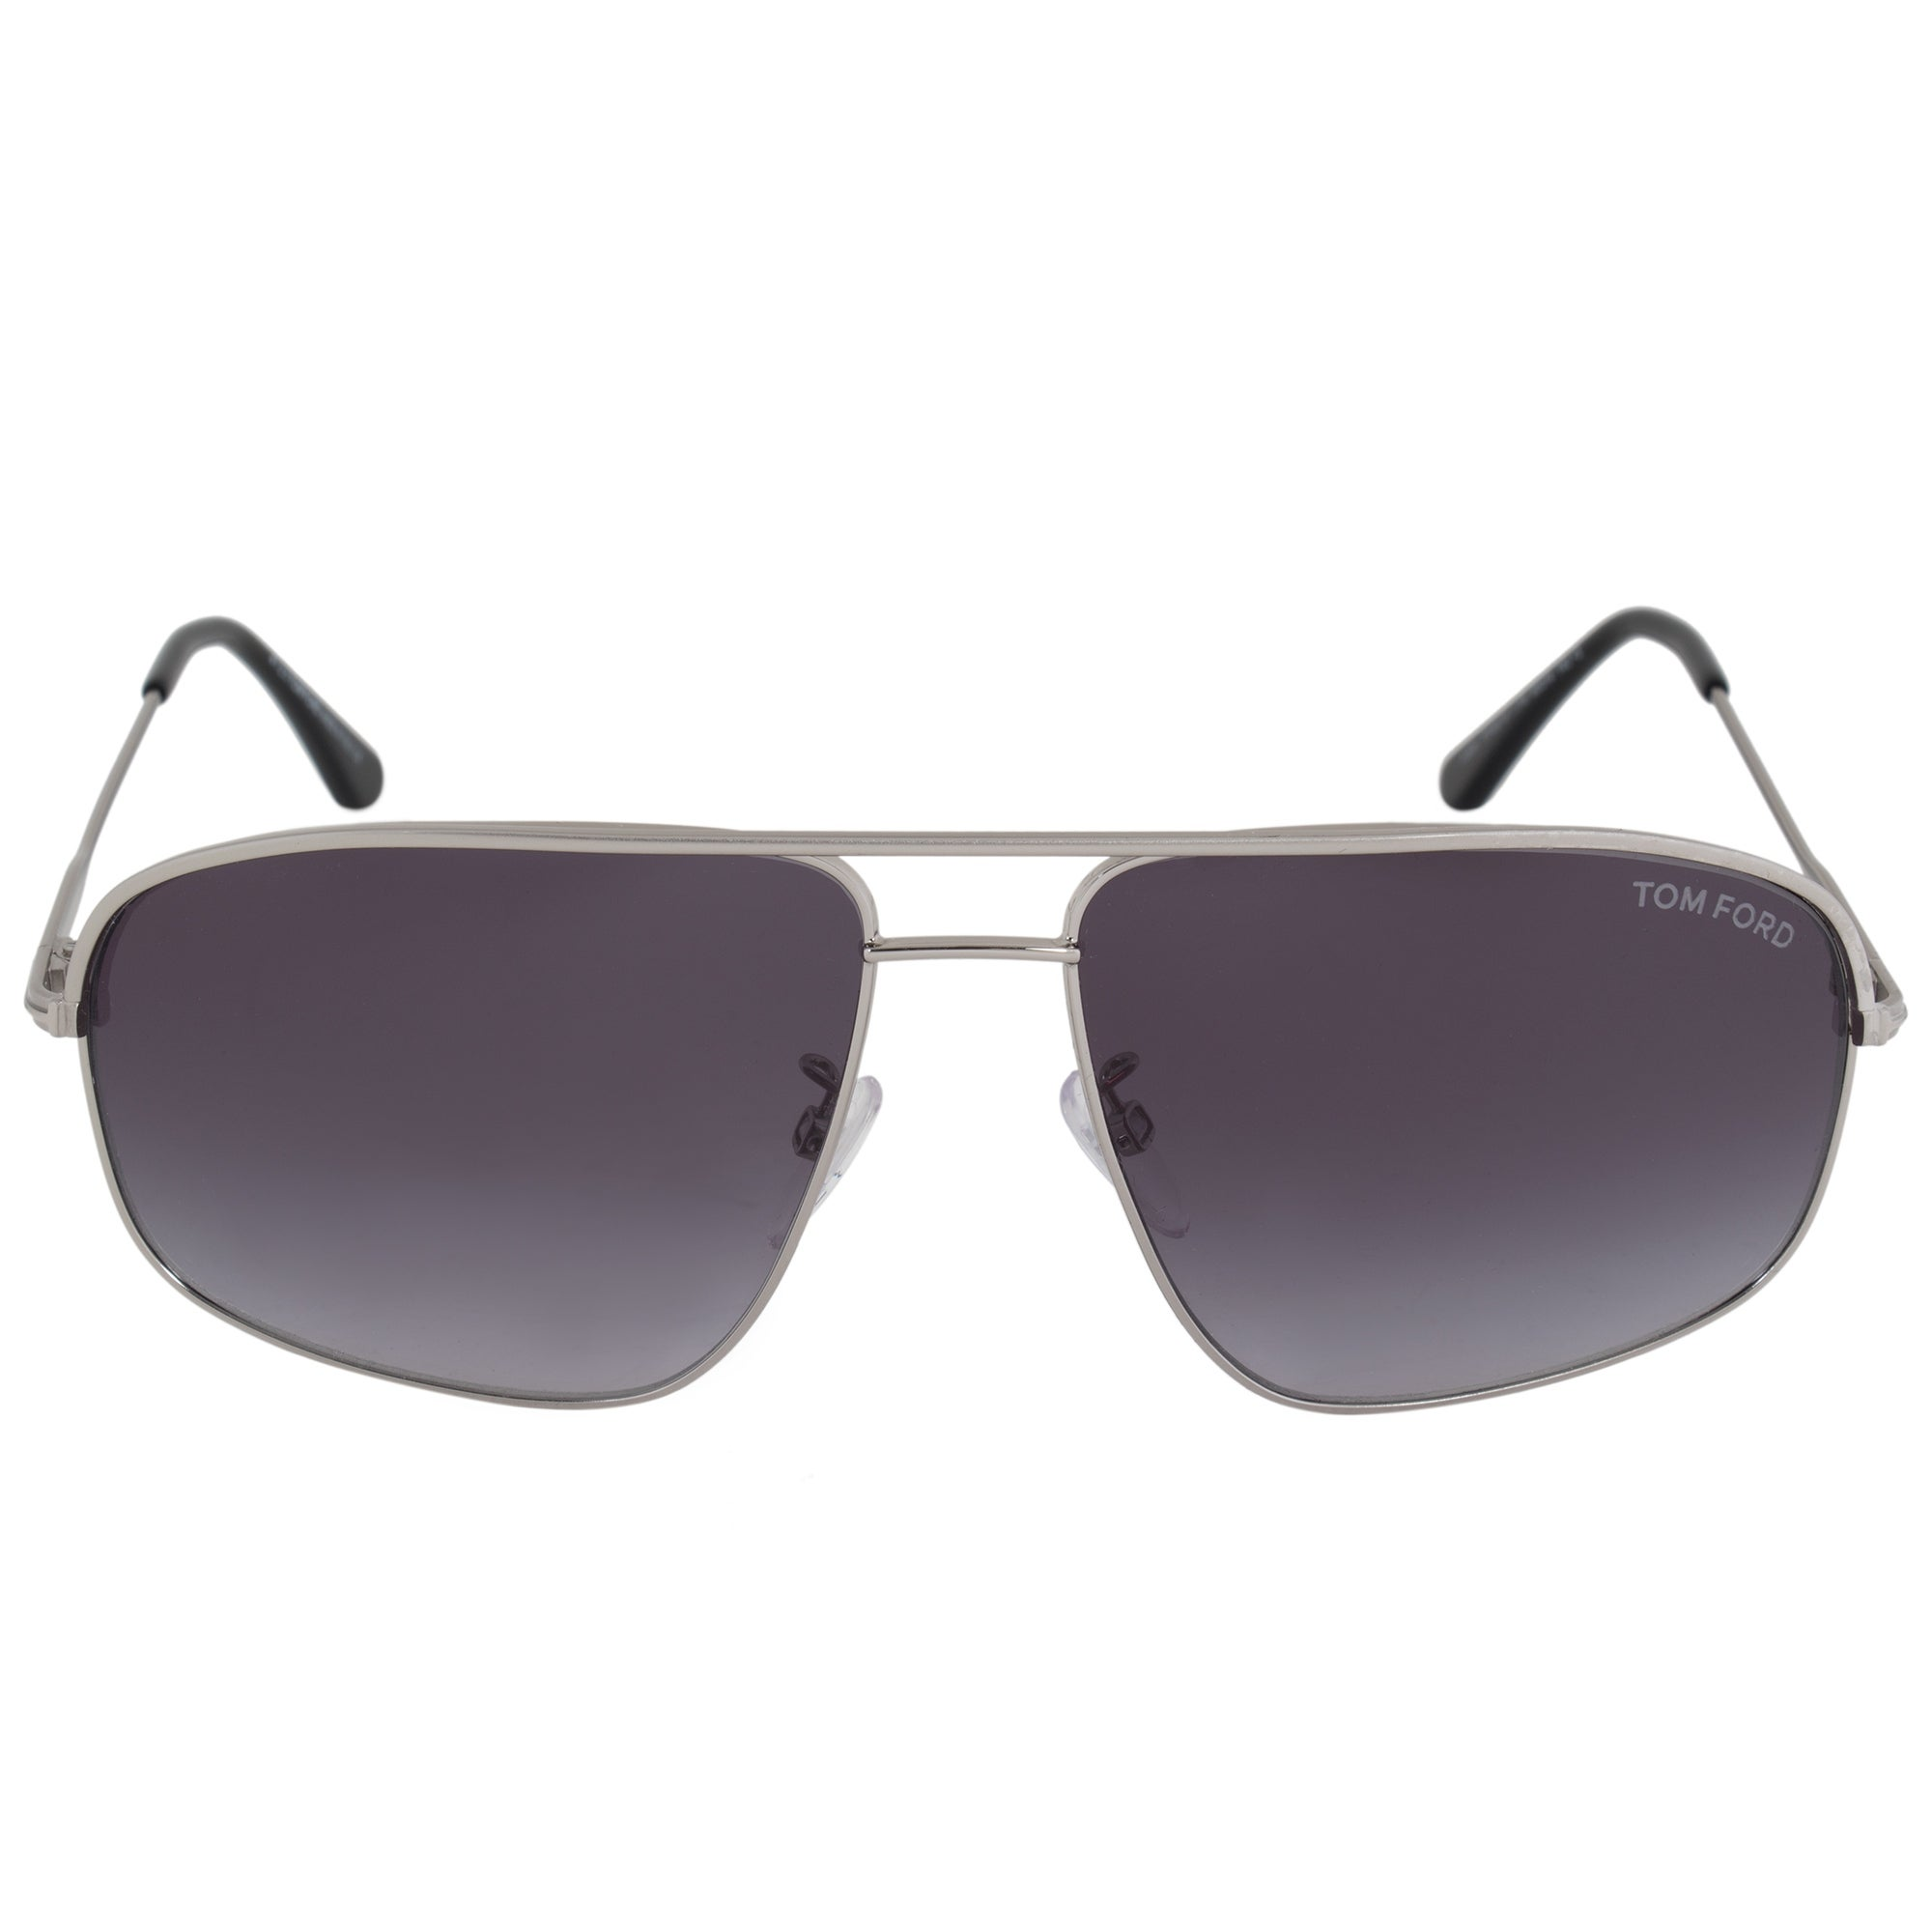 9987fc44959e7 Shop Tom Ford Justin Pilot Sunglasses FT0467 F 17W 60 - Free ...